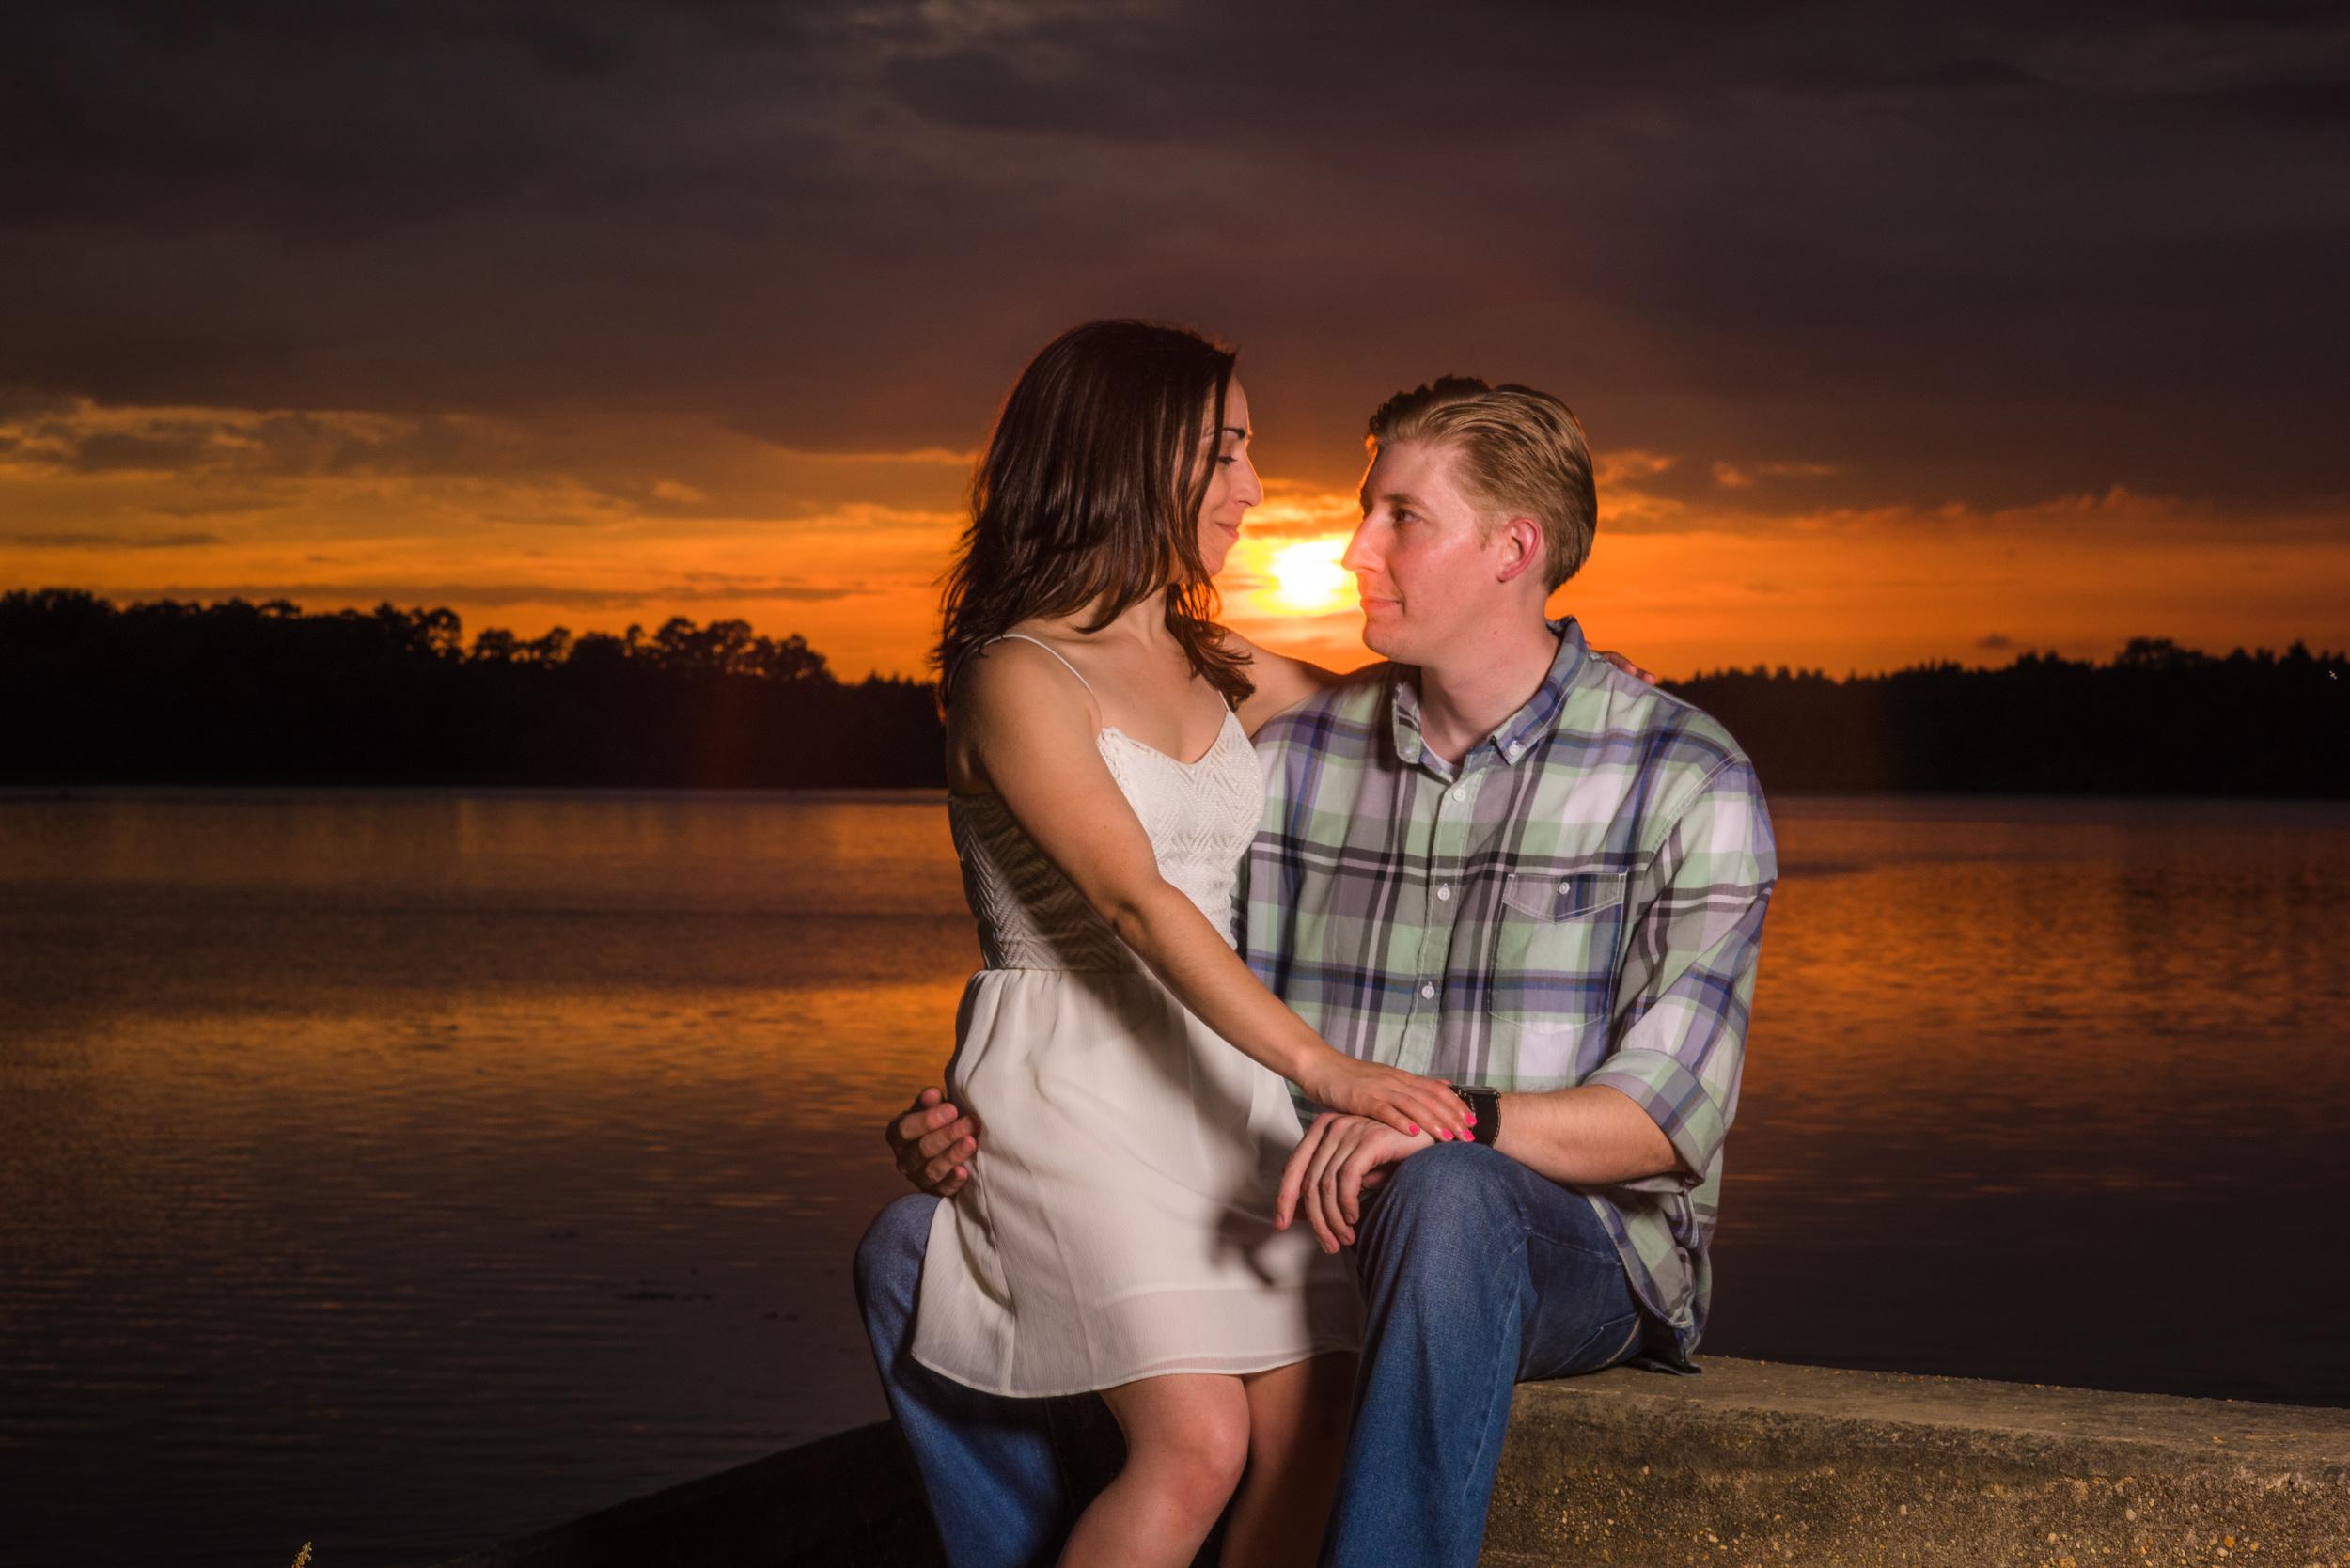 Parvins State Park Engagement Session Brian & Melissa 10